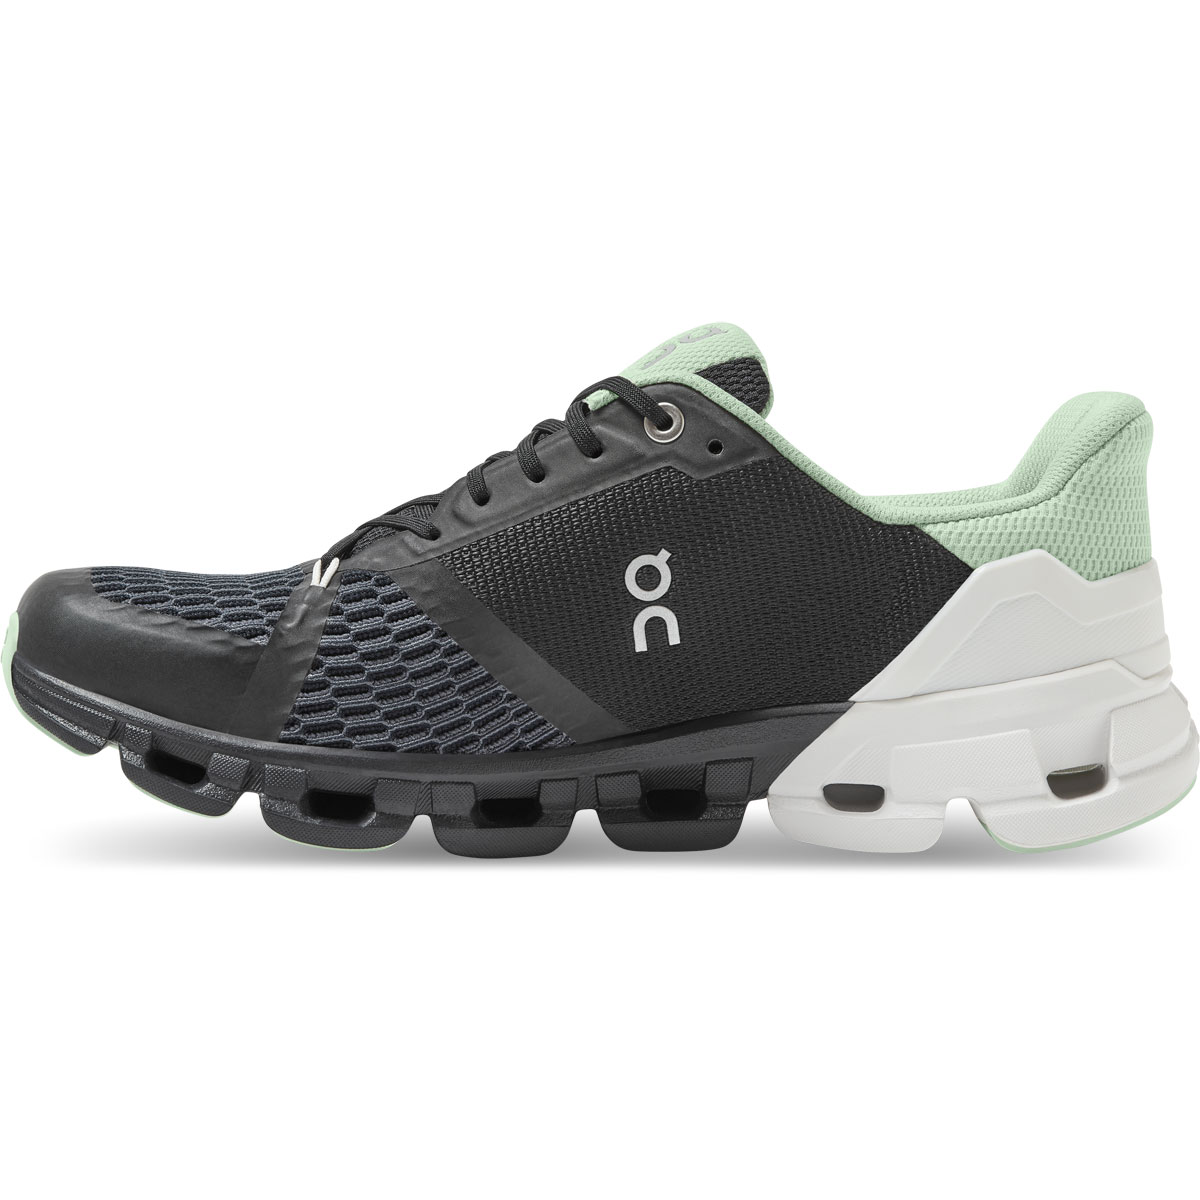 Women's On Cloudflyer 2.0 Running Shoe - Color: Black/White - Size: 5 - Width: Regular, Black/White, large, image 3